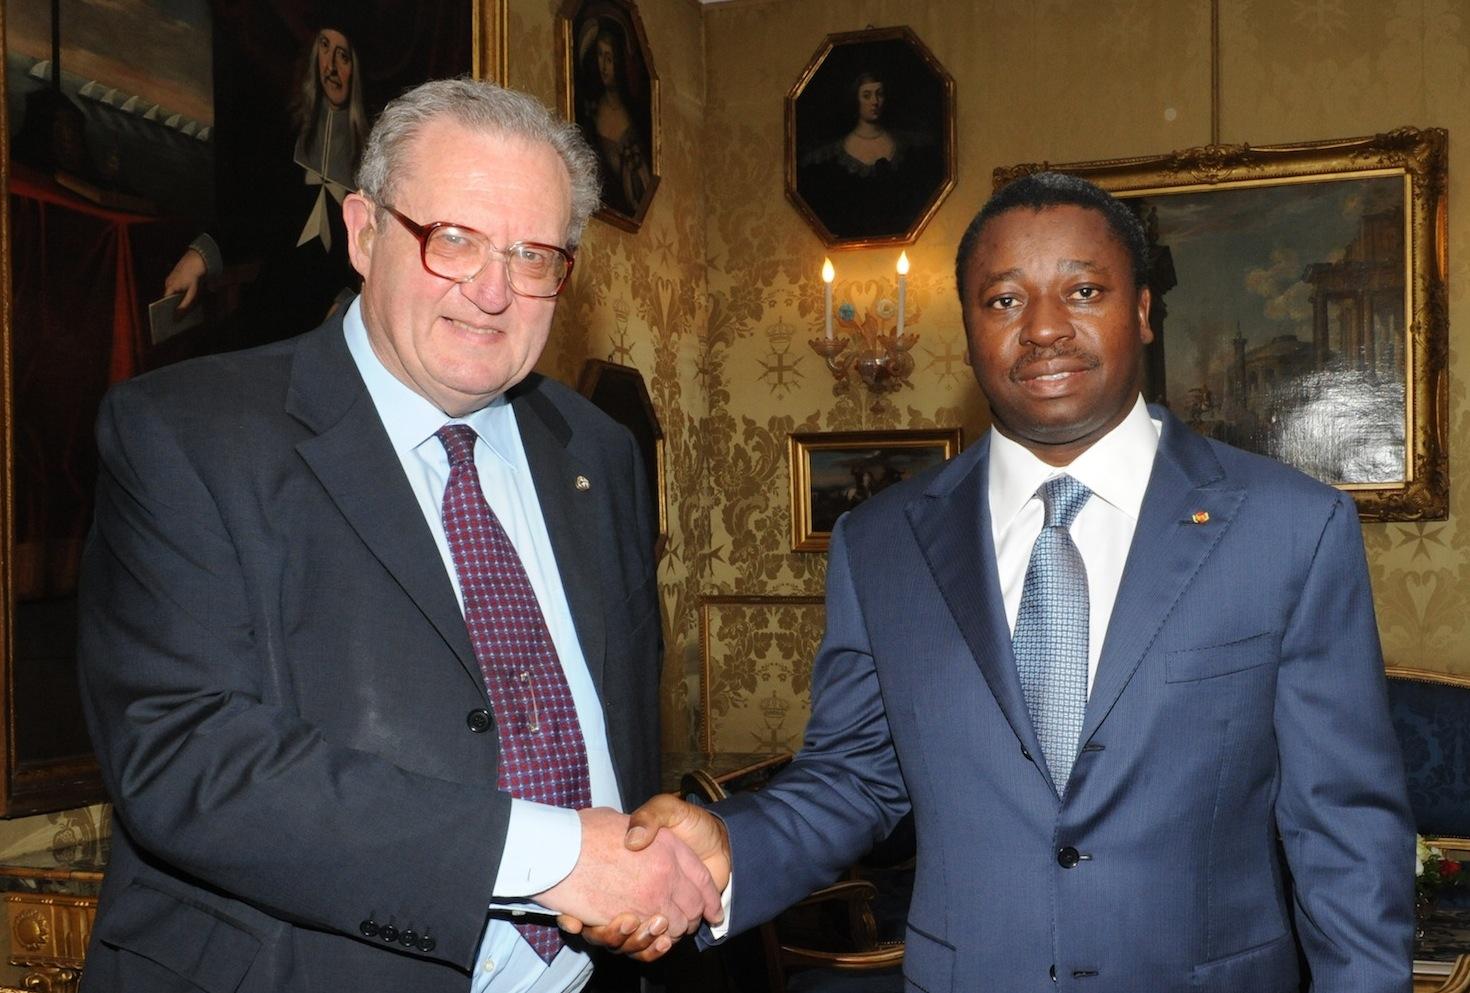 #Togo #Italie #ItalyPedogate #PizzaGate #Florence Rodolfo ...